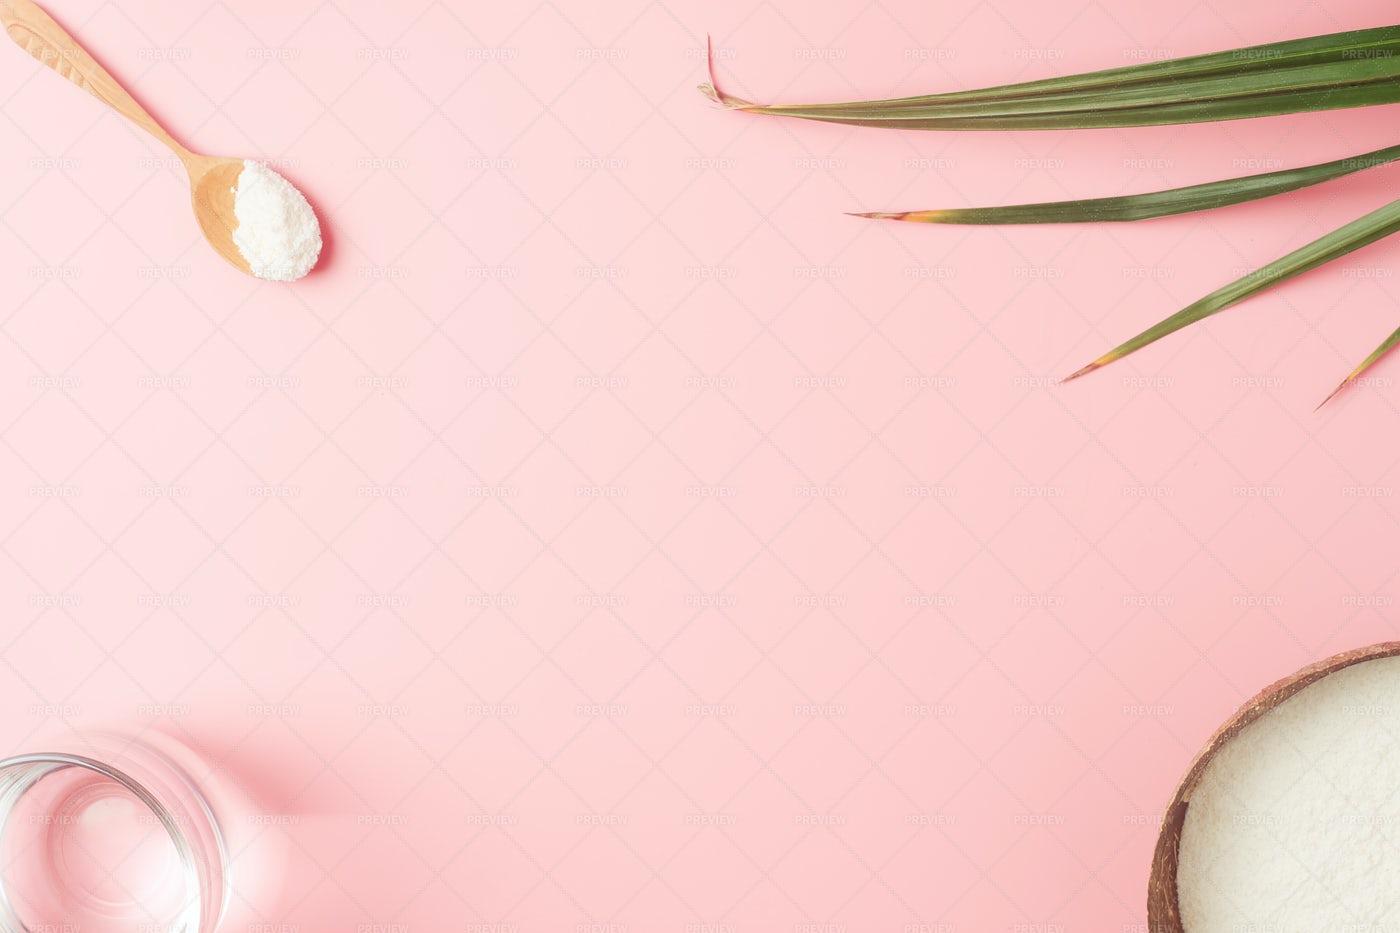 Frame With Collagen Powder: Stock Photos